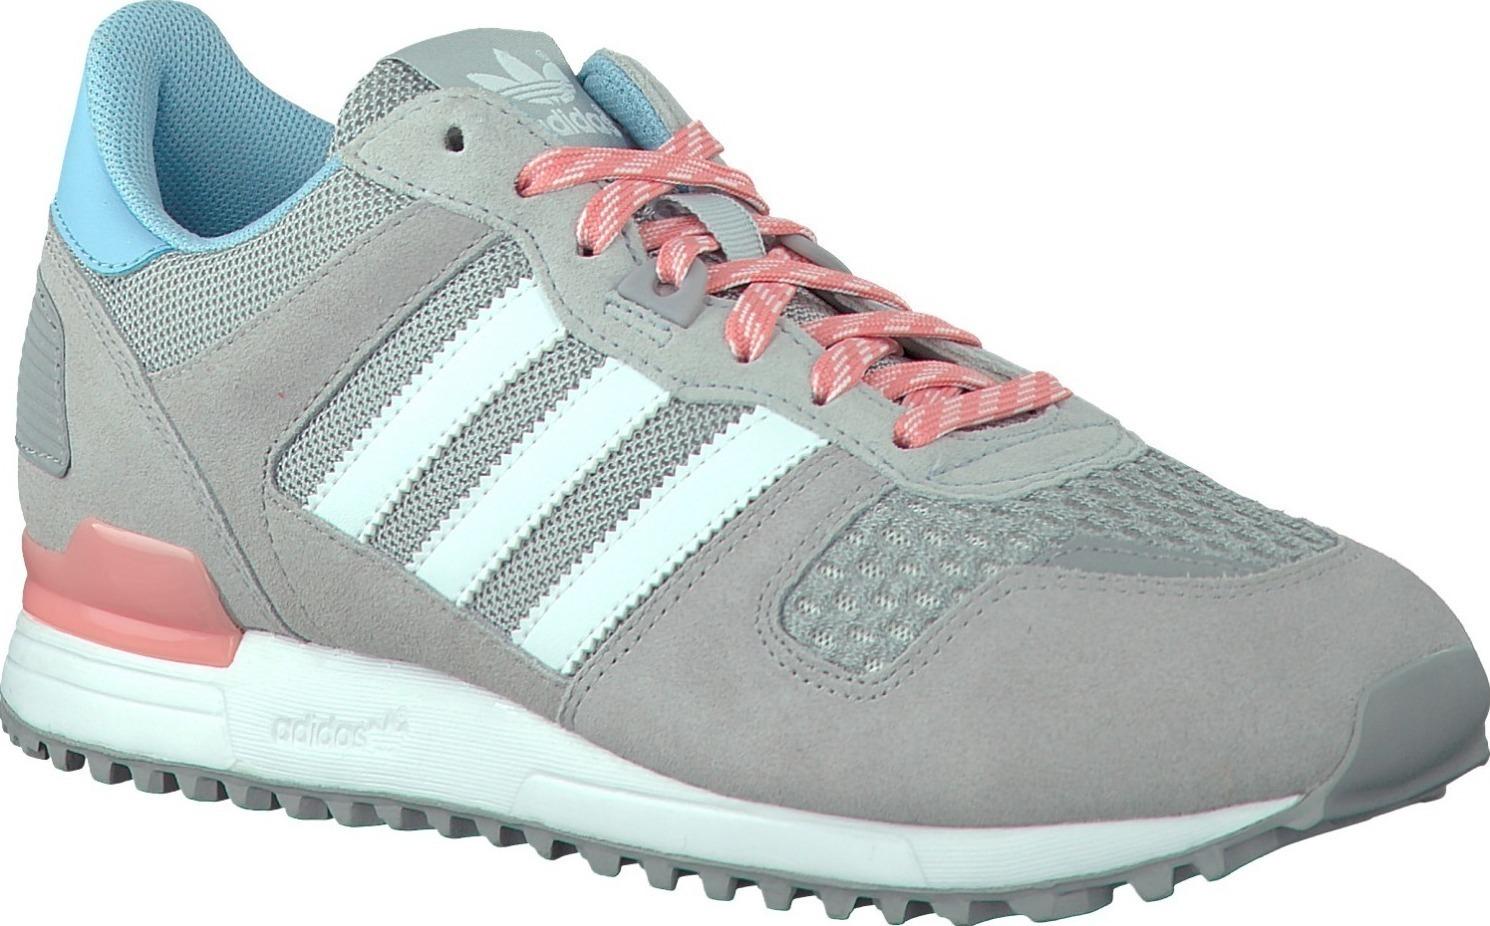 ed6e0a4ef4bb44 adidas originals zx 700 - Sneakers - Skroutz.gr